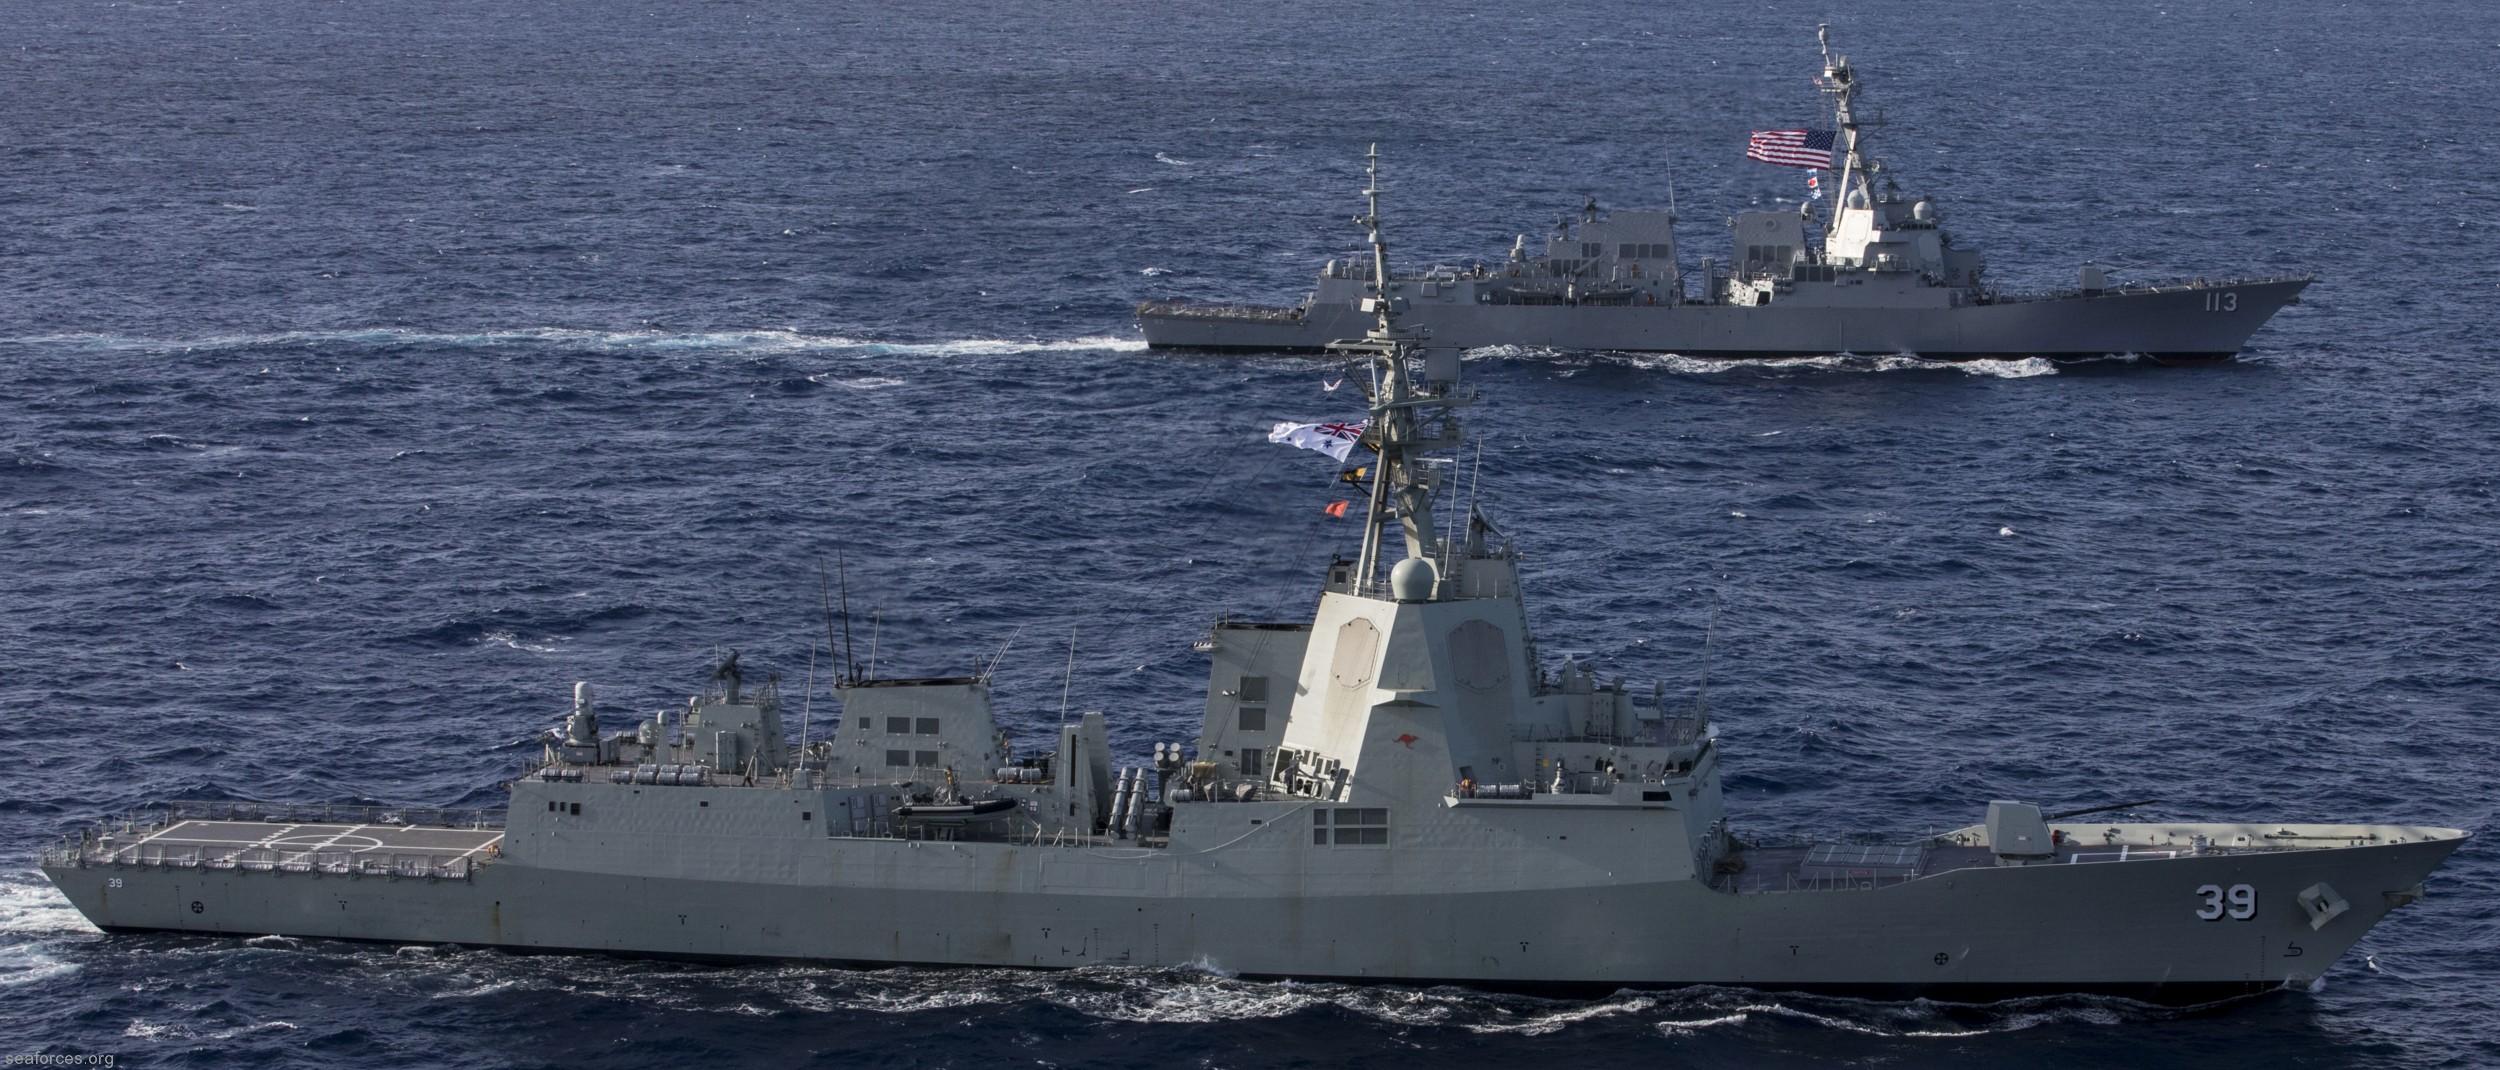 hobart class guided missile destroyer royal australian navy ddgh hmas brisbane sydney